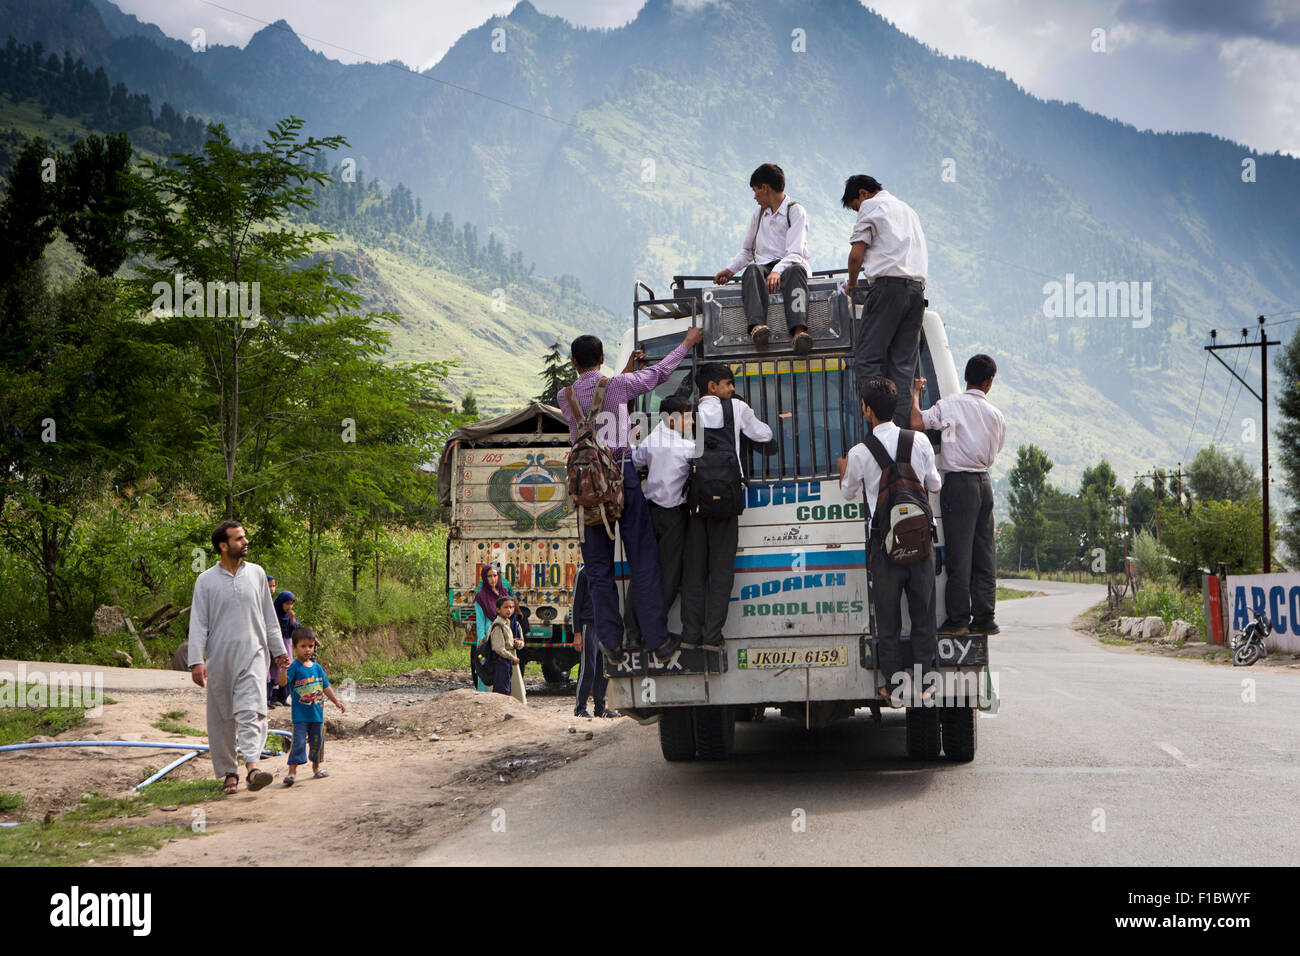 India, Jammu & Kashmir, Srinagar to Leh Highway, school children clinging to back of overloaded bus - Stock Image